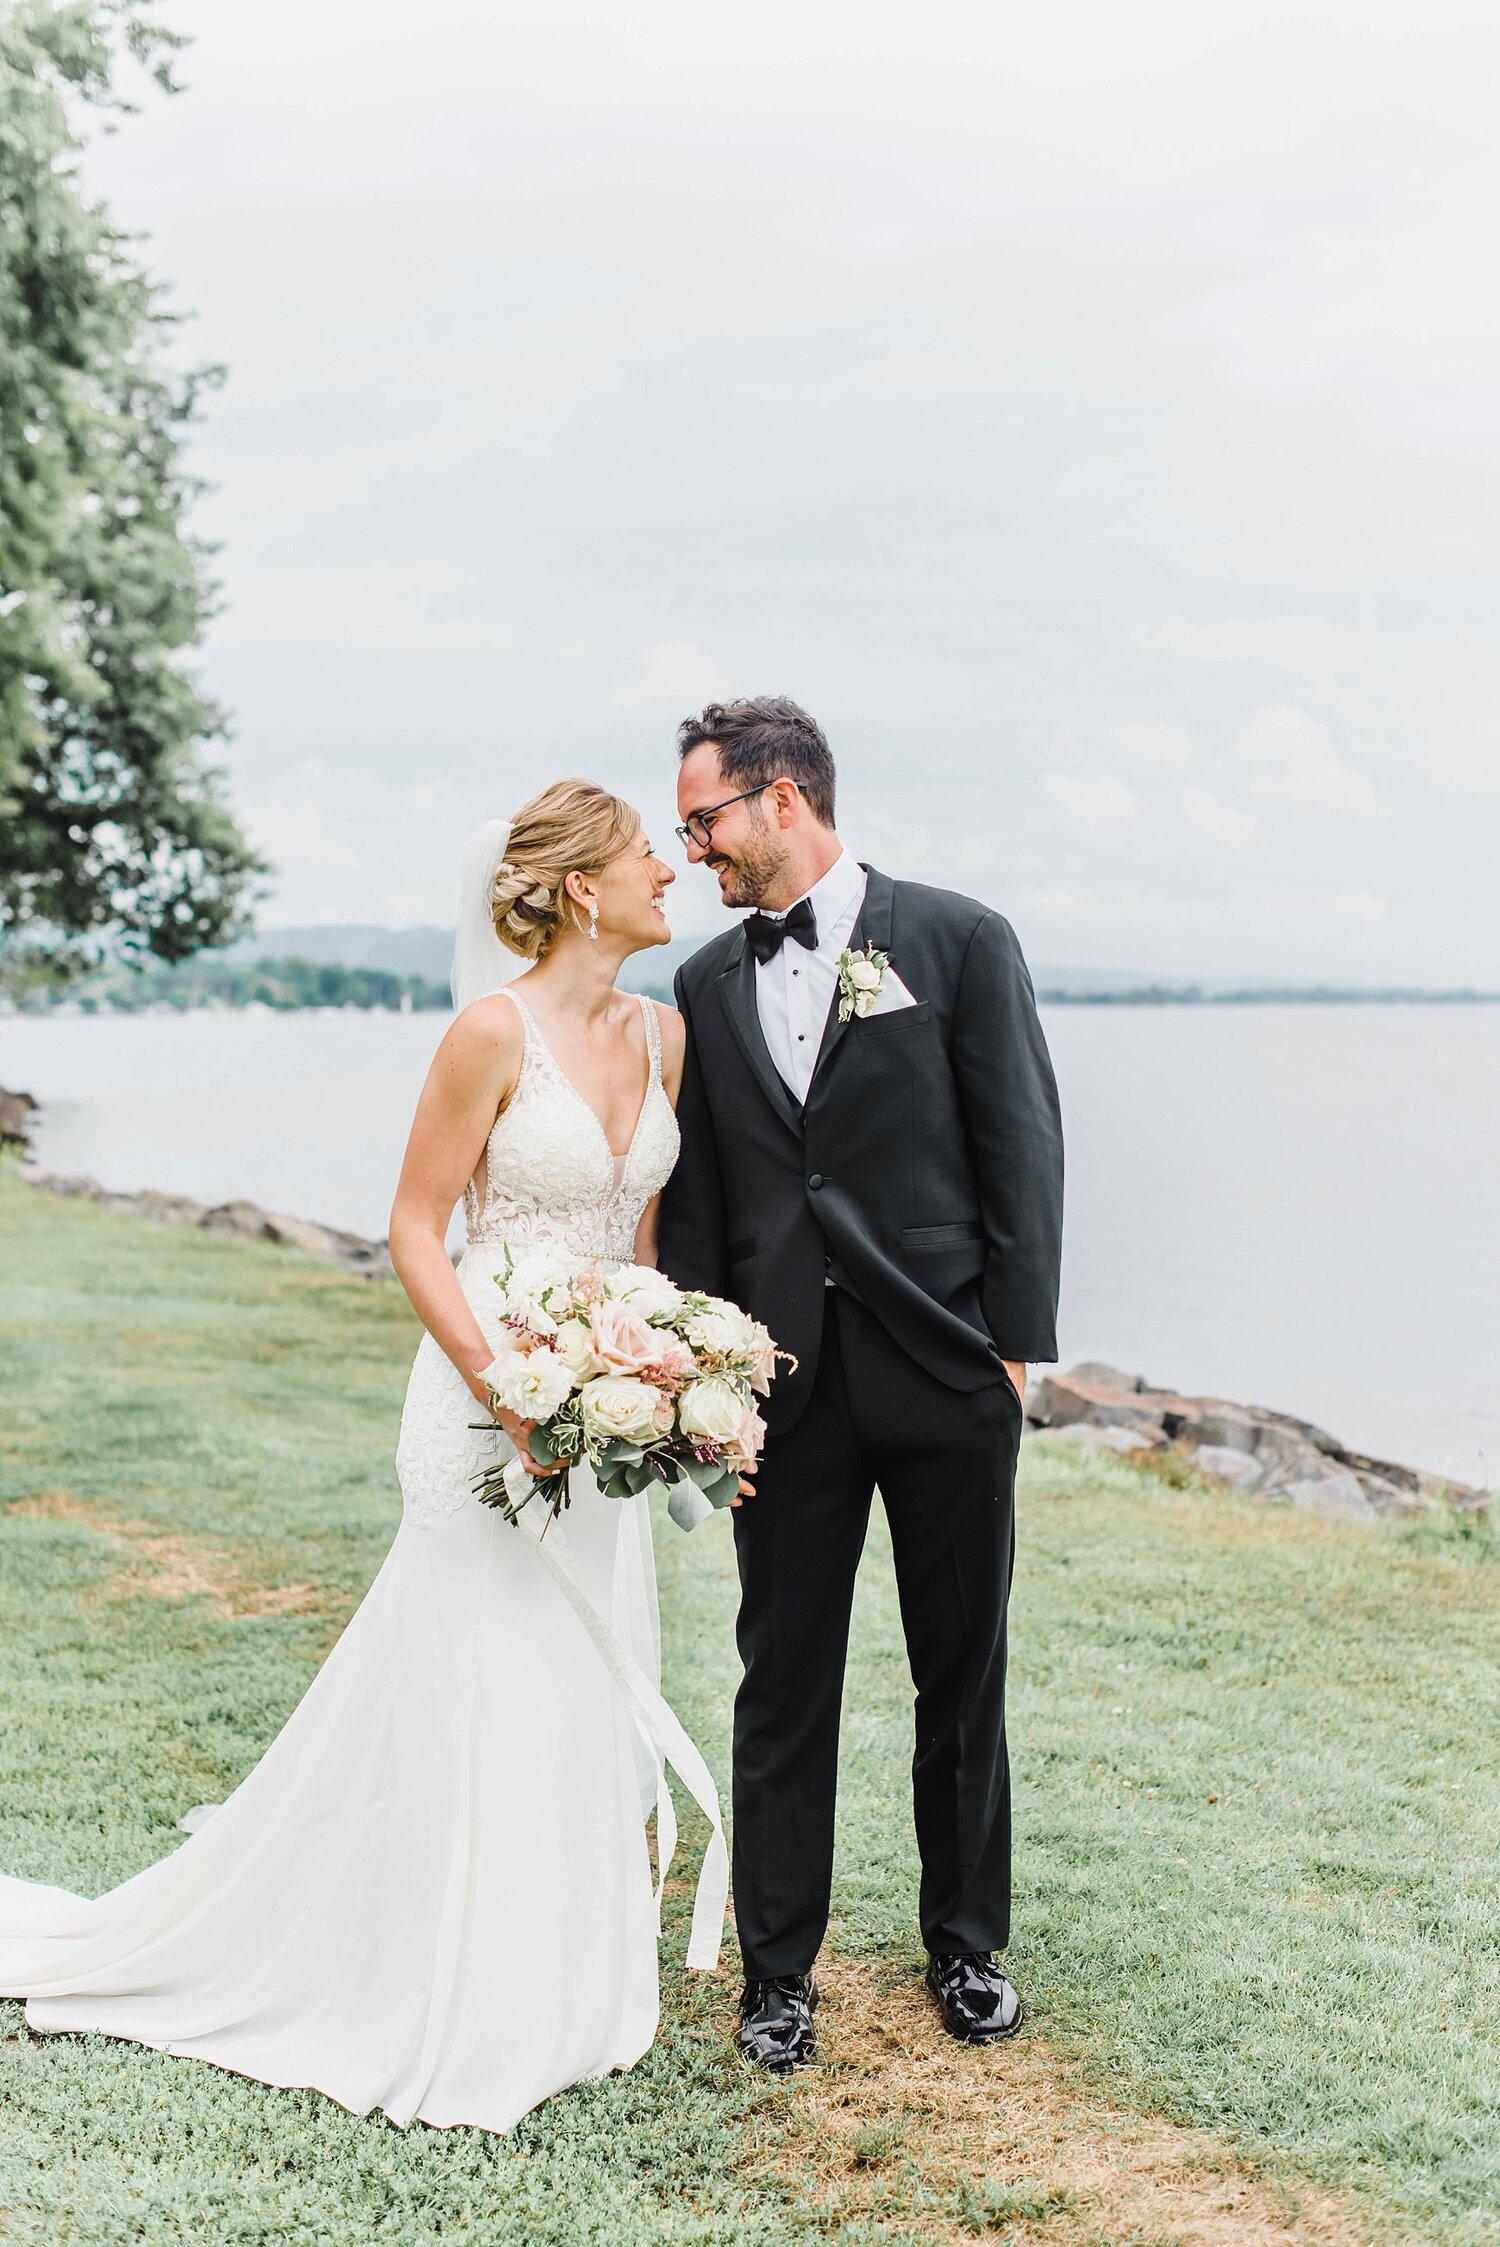 light airy fine art ottawa wedding photographer | Ali and Batoul Photography | Fairmont Le Chateau Montebello52.jpg